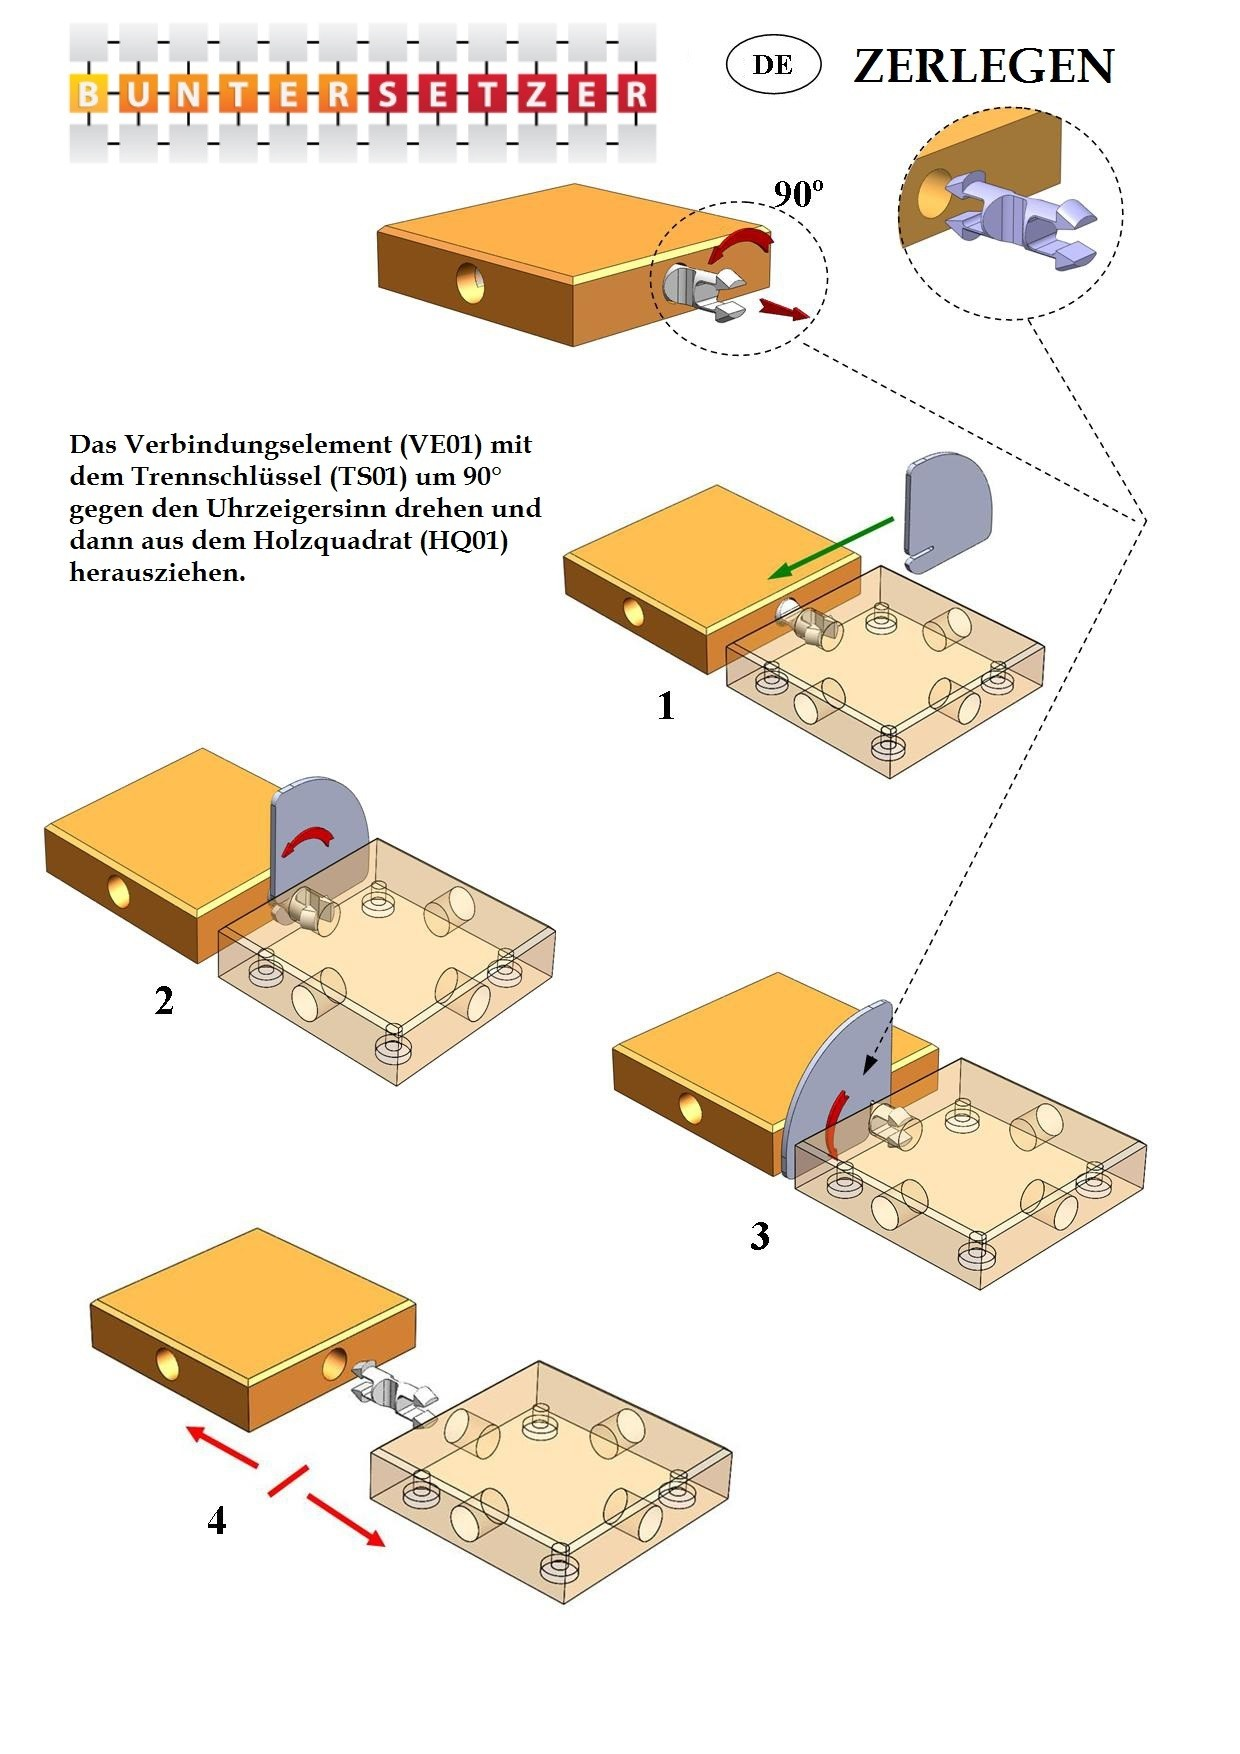 Buntersetzer-Zerlegen